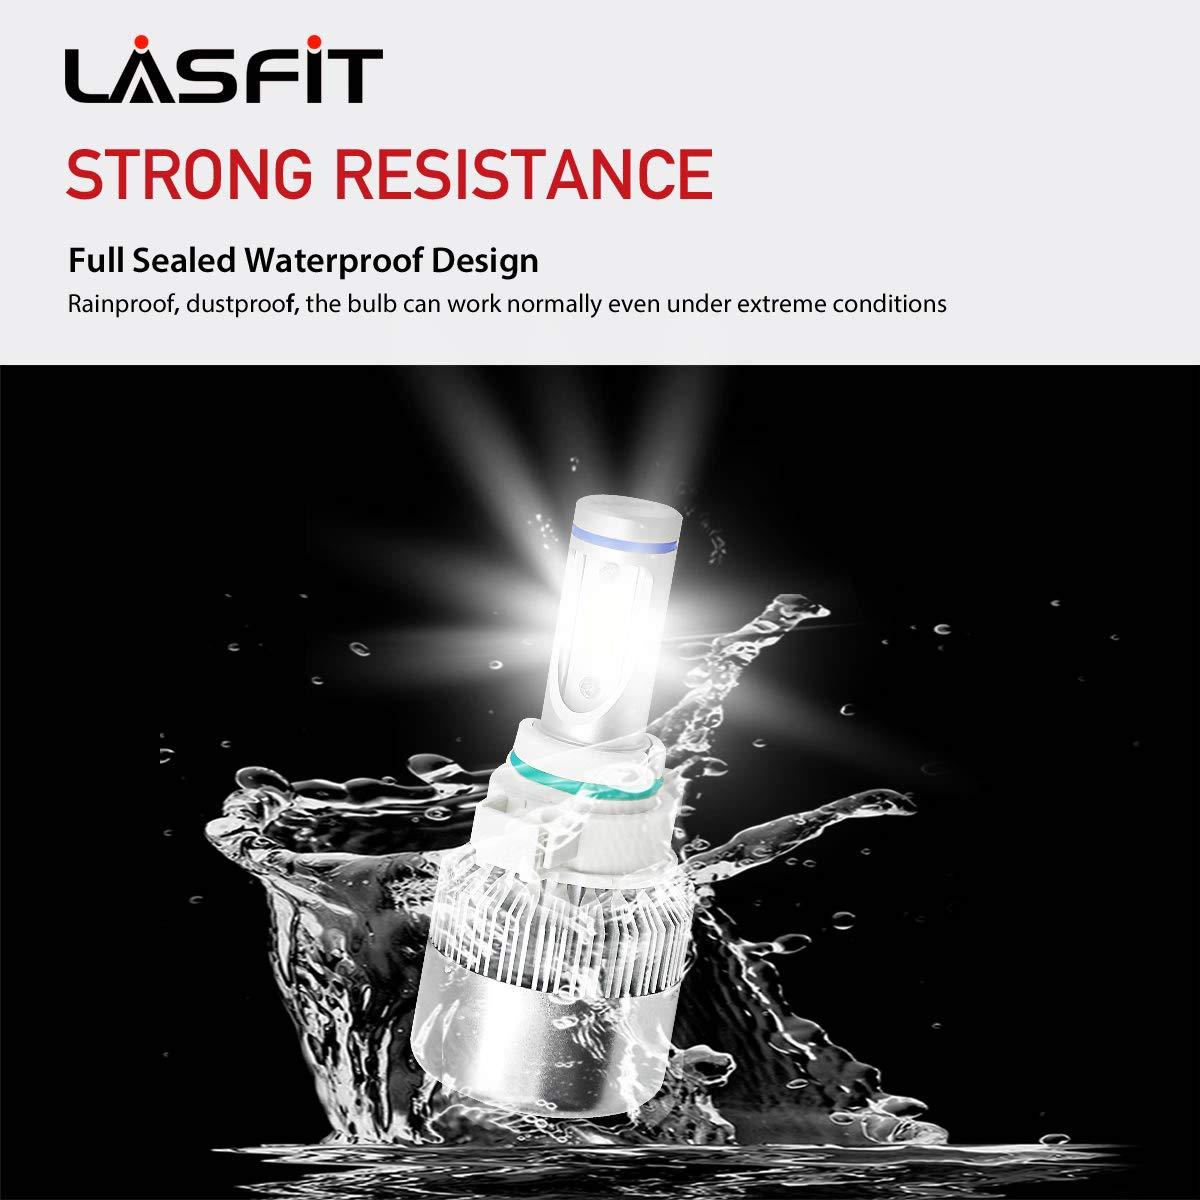 LASFIT 5202/5201/2504 LED Fog Light 60W 7600LM 6000K Cool White LED Bulbs-Plug&Play (2 pack) by LASFIT (Image #9)